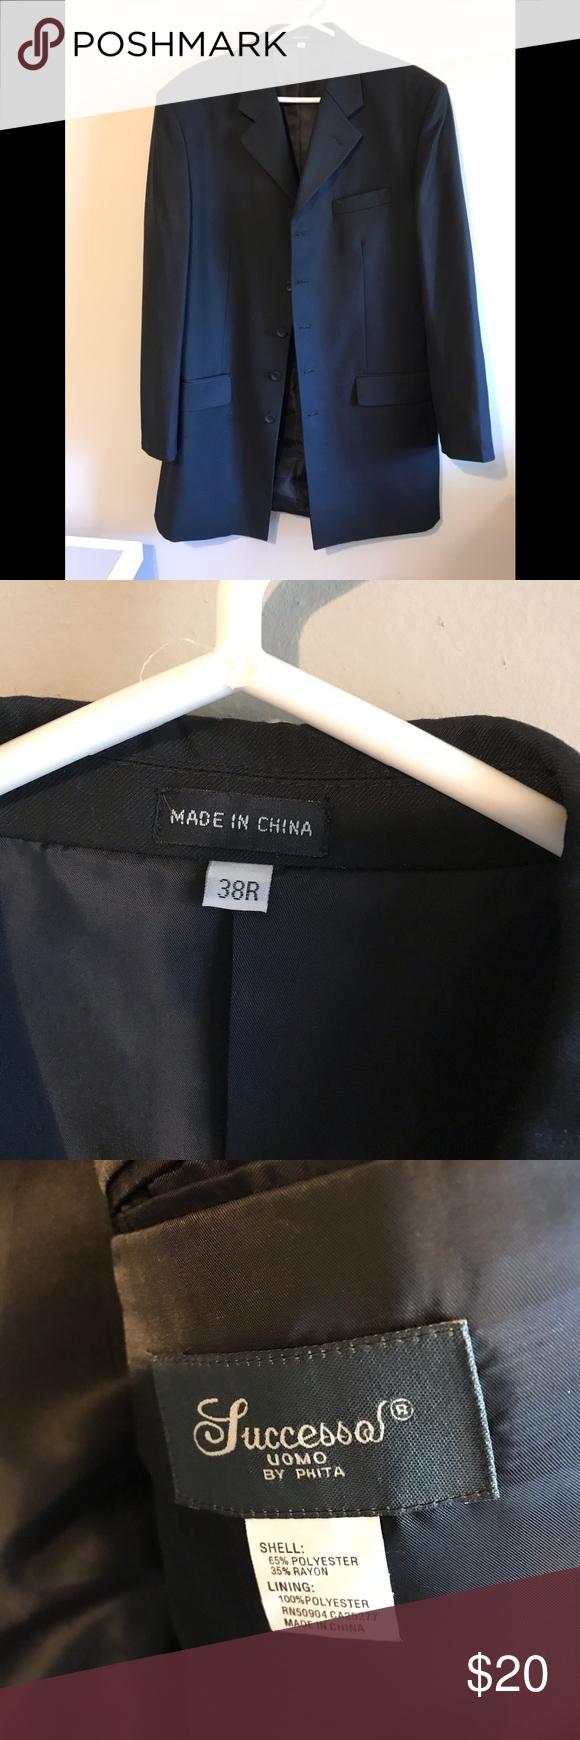 Men S Successol Black Dress Jacket Black Dress Jacket Jacket Dress Jackets [ 1740 x 580 Pixel ]